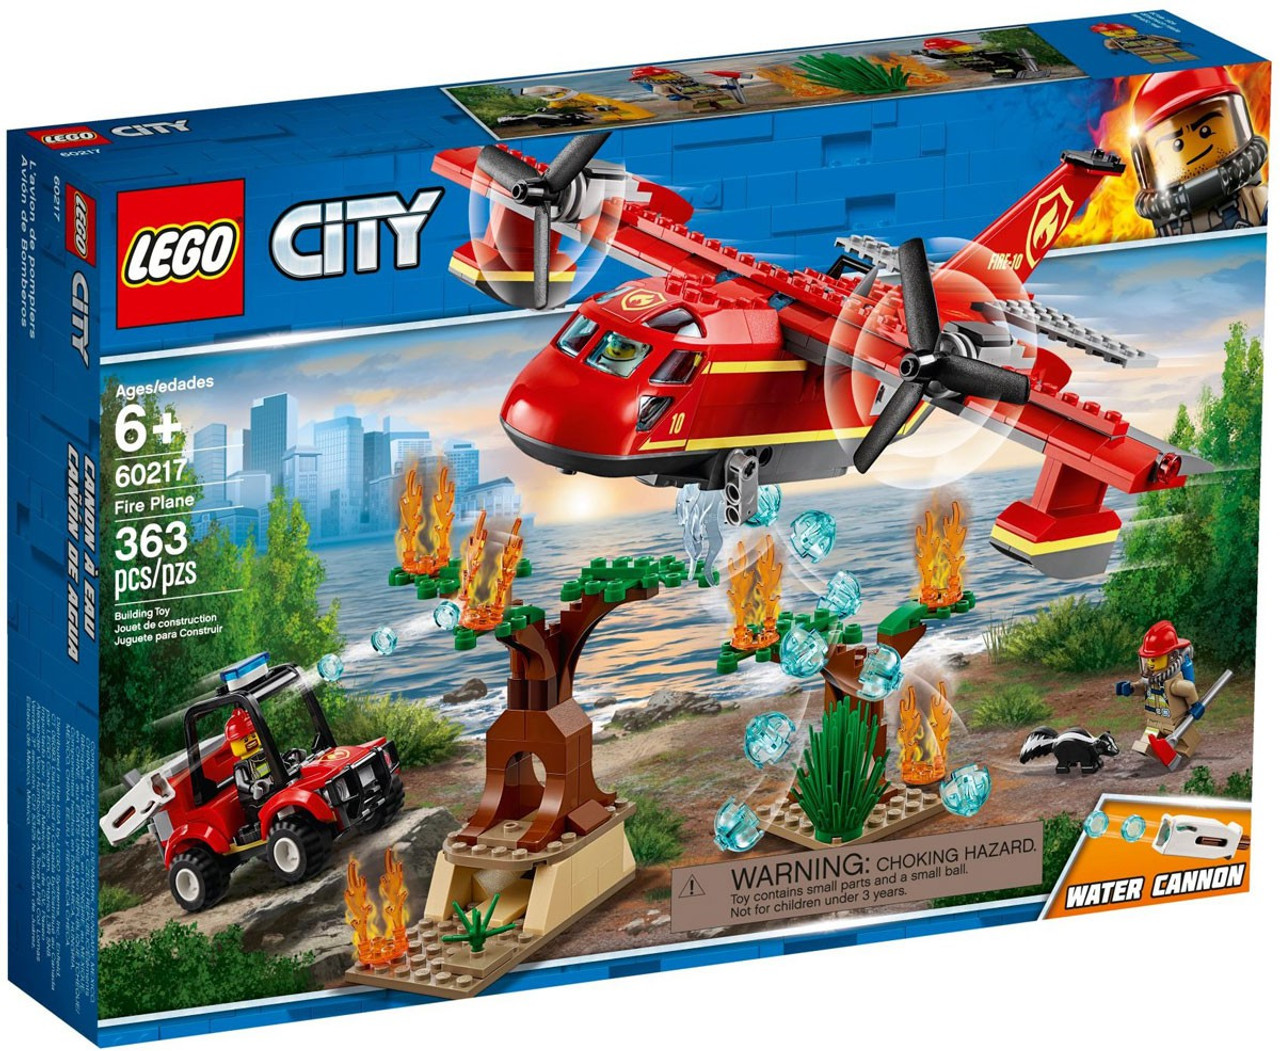 LEGO City Fire Plane Set #60217